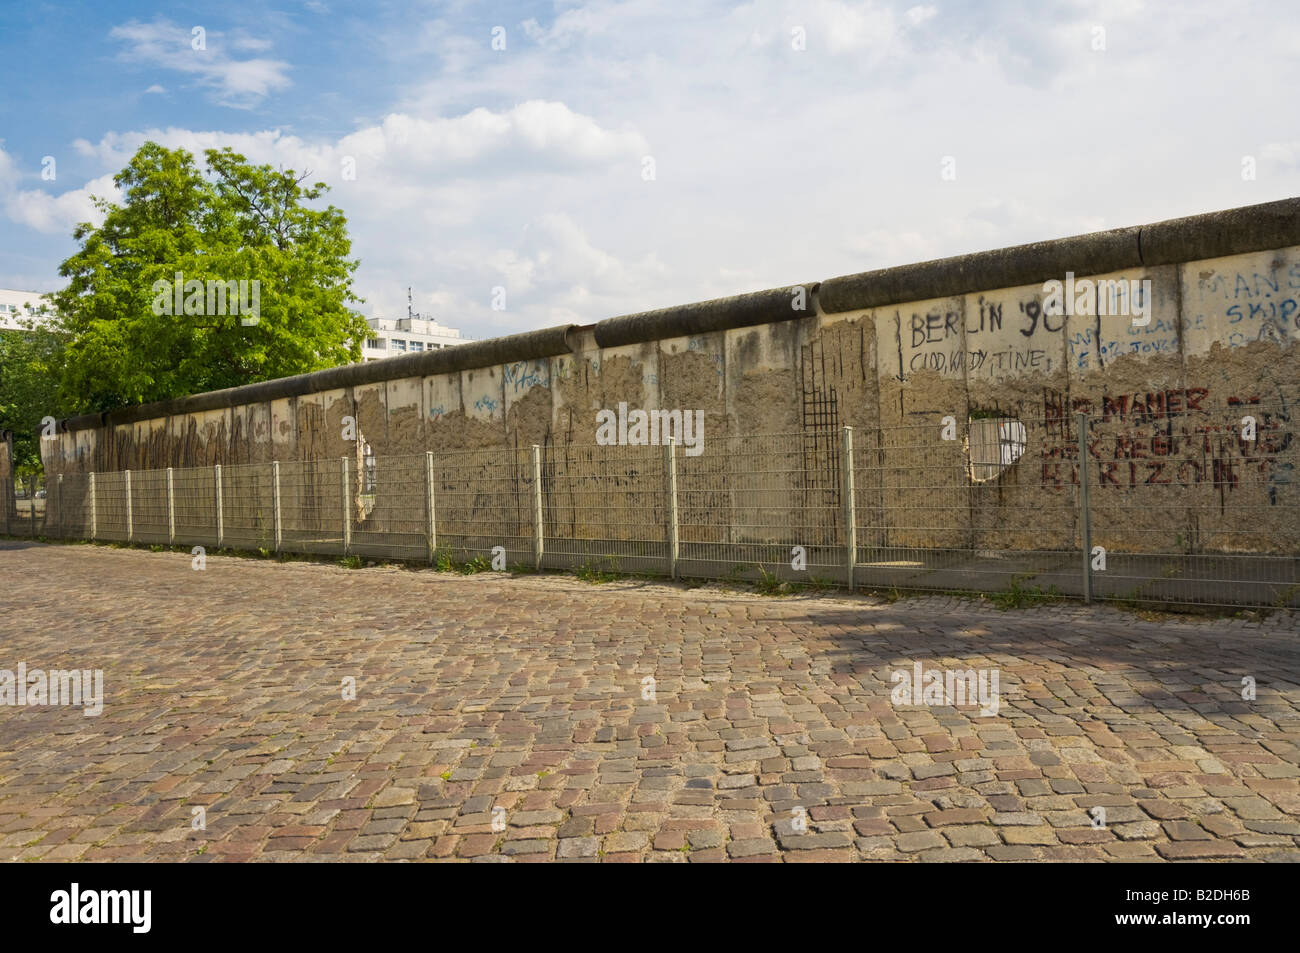 Reste du mur de Berlin près de Checkpoint Charlie Niederkirchner strasse Berlin city centre Allemagne Europe Photo Stock